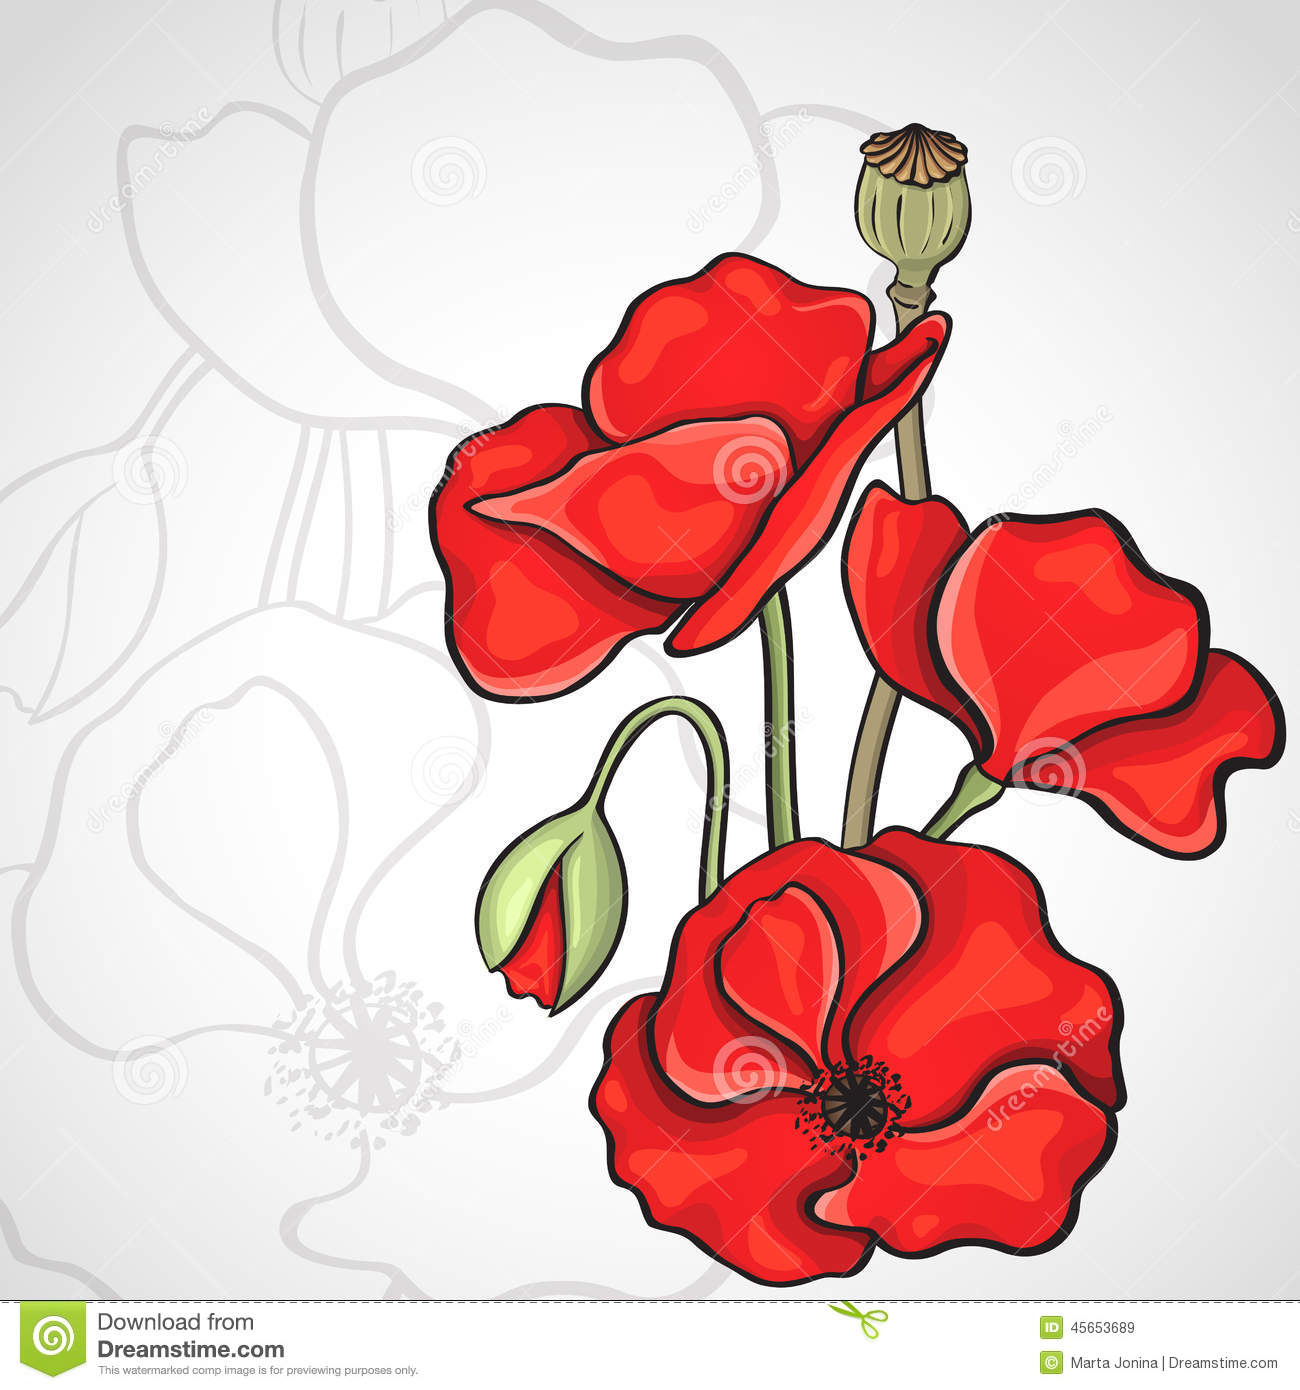 Drawn poppy poppy field Template poppy poppy drawing Search